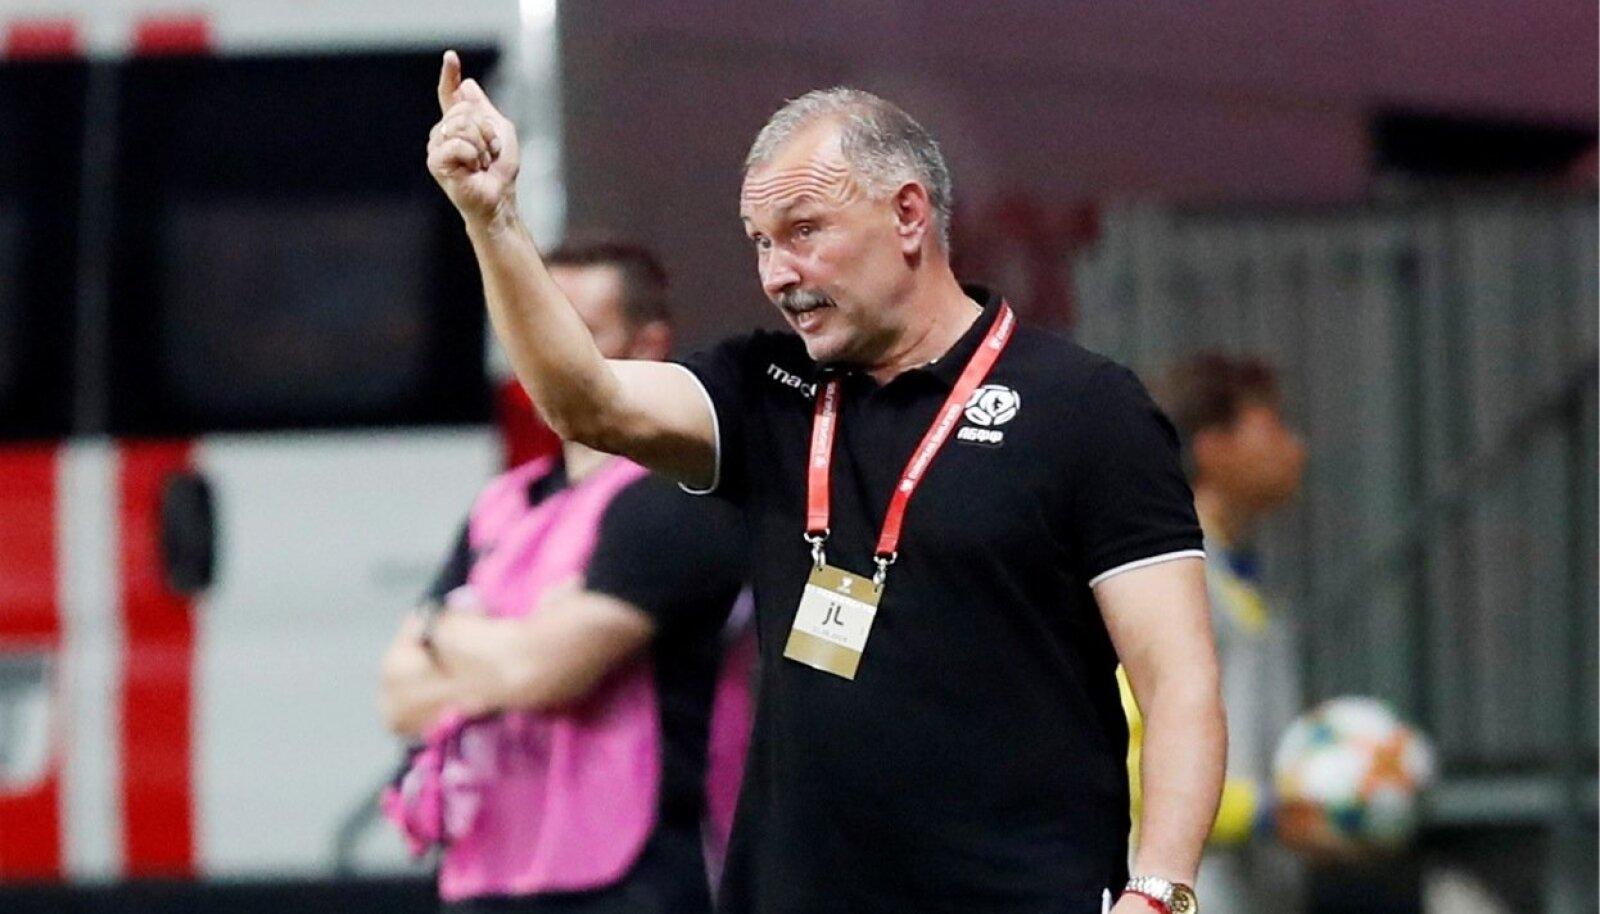 Euro 2020 Qualifier - Group C - Belarus v Northern Ireland